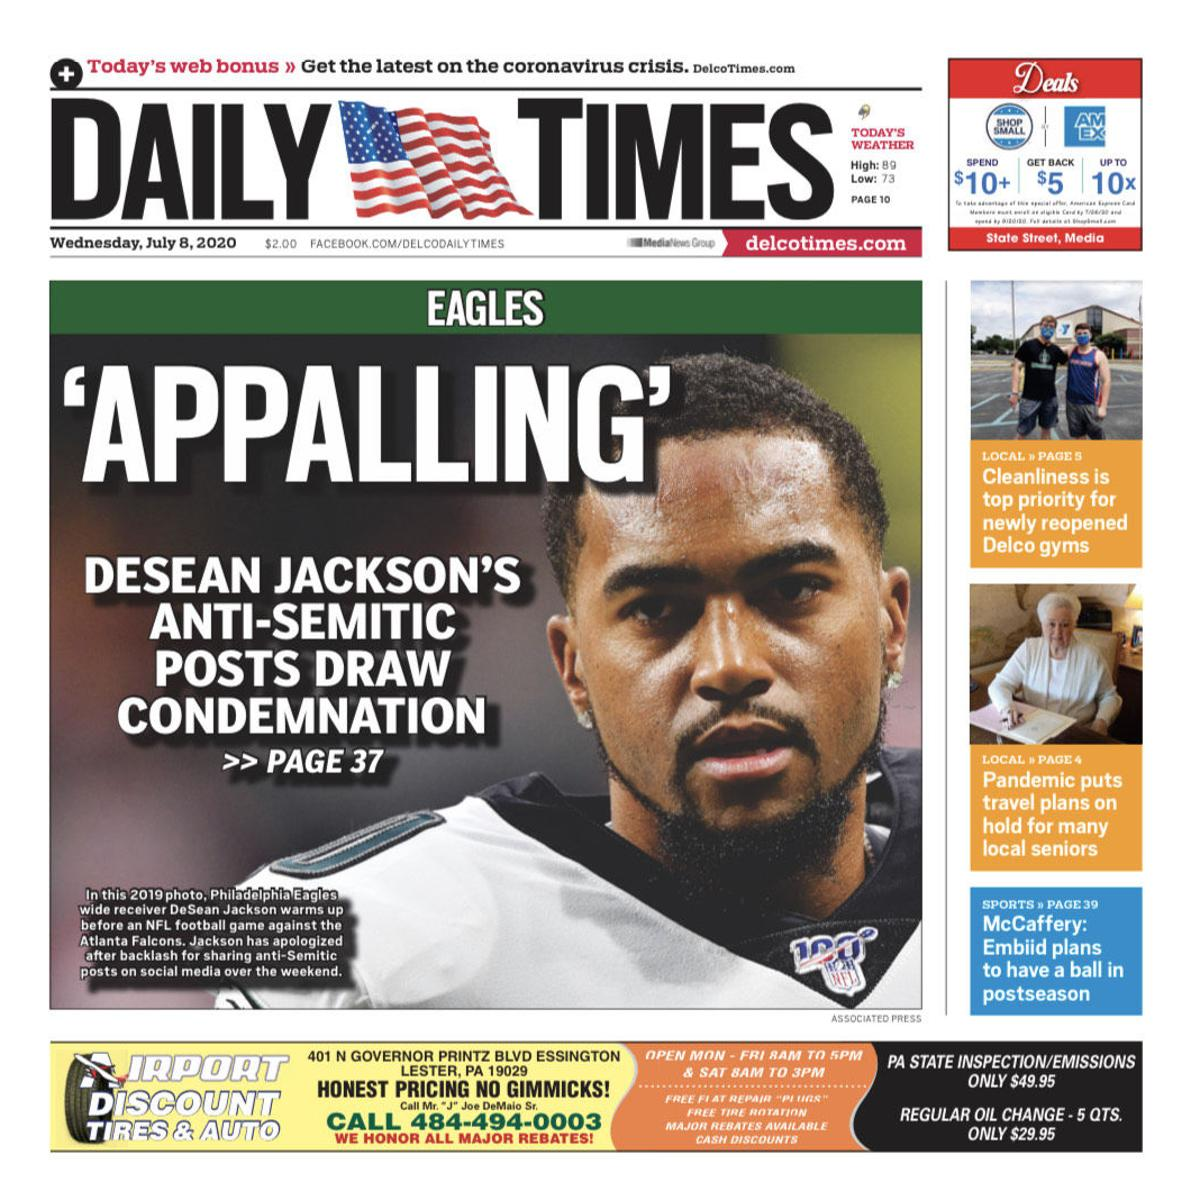 DeSean JACKSON Daily Times